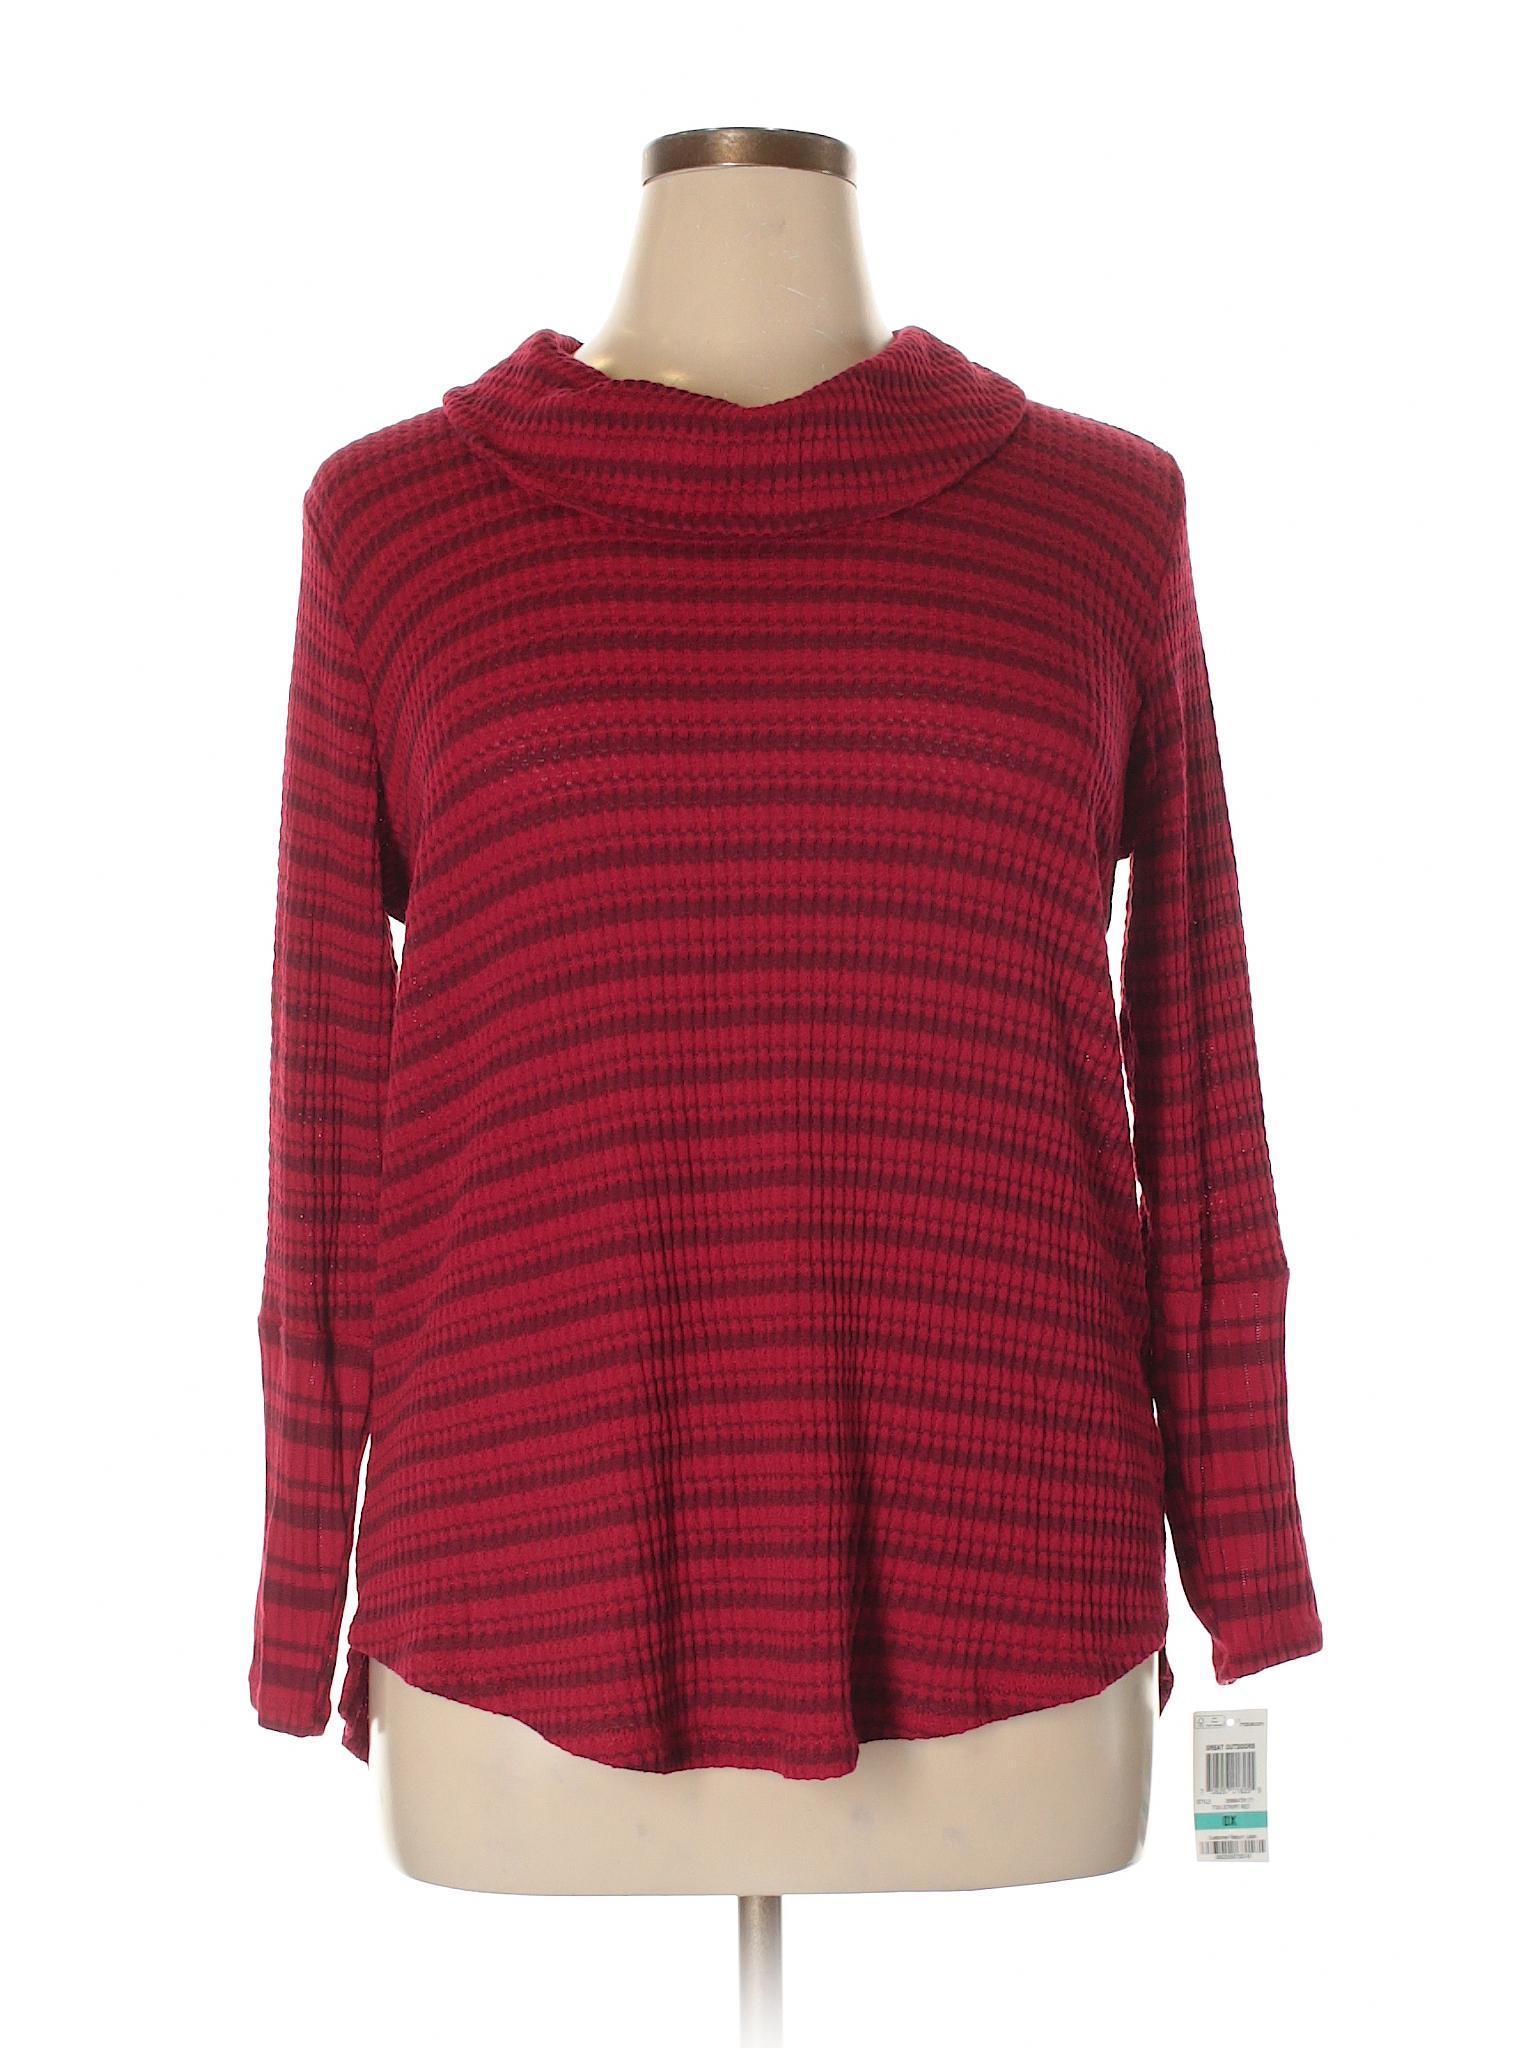 Boutique amp;Co Boutique Sweater Pullover Style Pullover amp;Co Sweater Style amp;Co Pullover Style Boutique xU8RZq